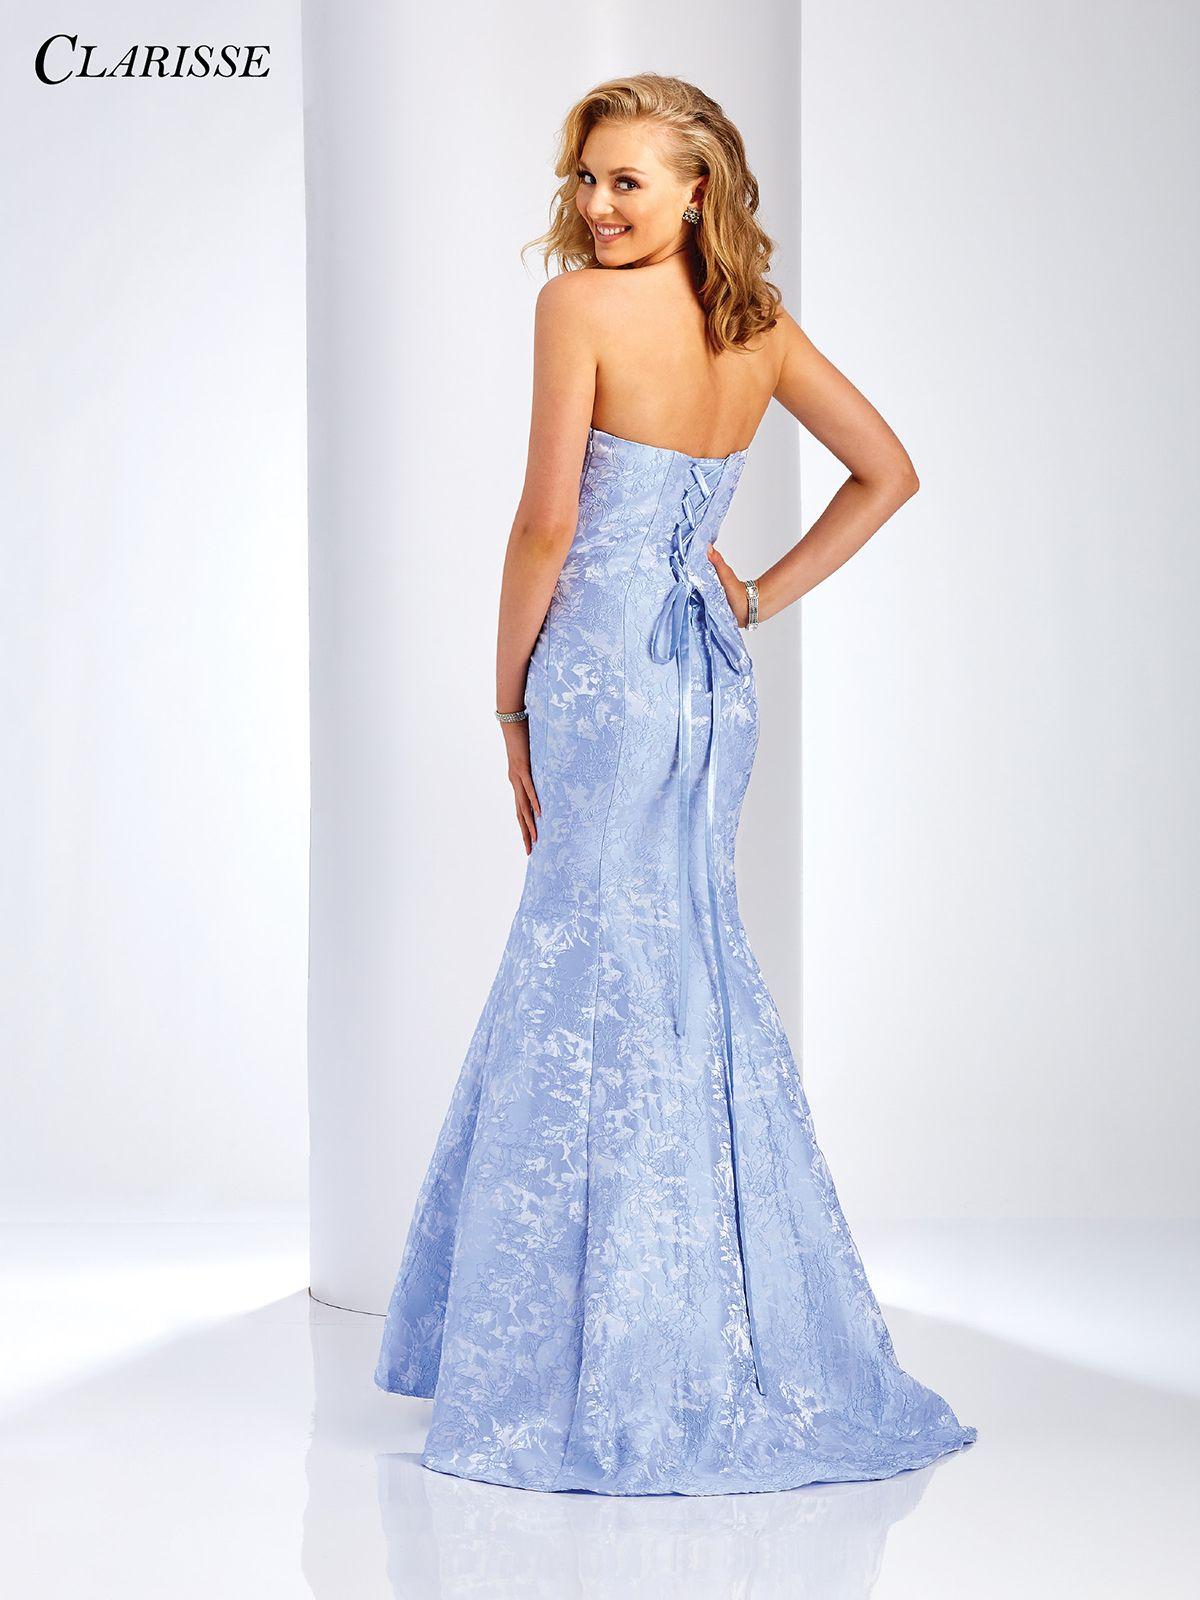 Strapless Brocade Mermaid Prom Dress 3415 3 Colors Prom Dresses For Sale Prom Dresses Beautiful Prom Dresses [ 1600 x 1200 Pixel ]